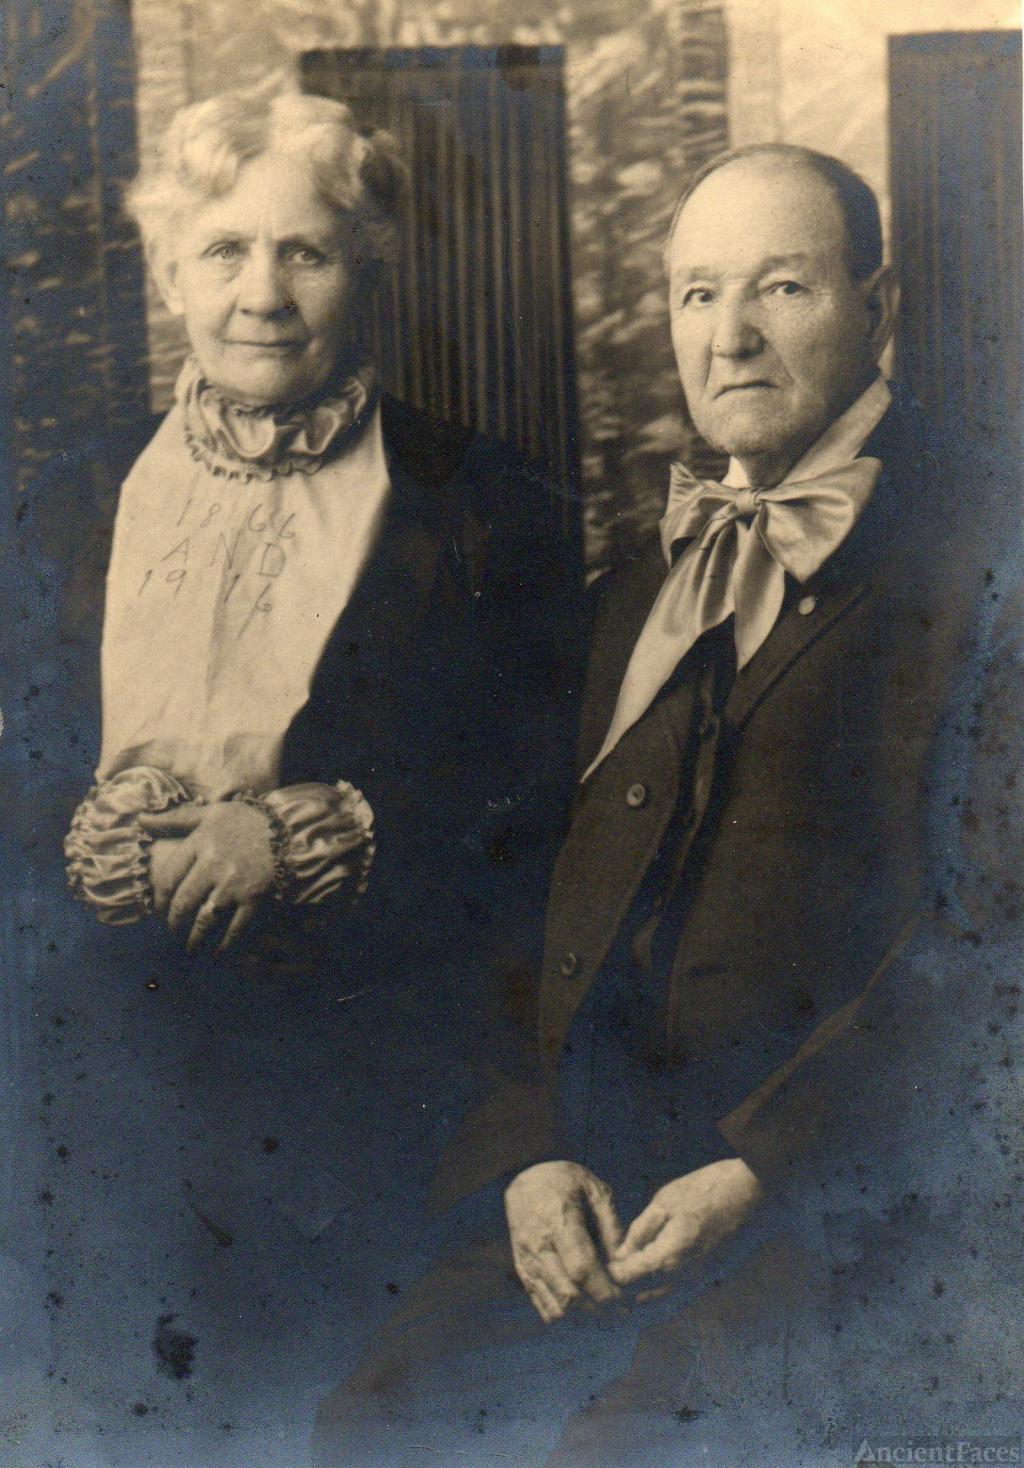 Pvt. William and Sarah McStotts